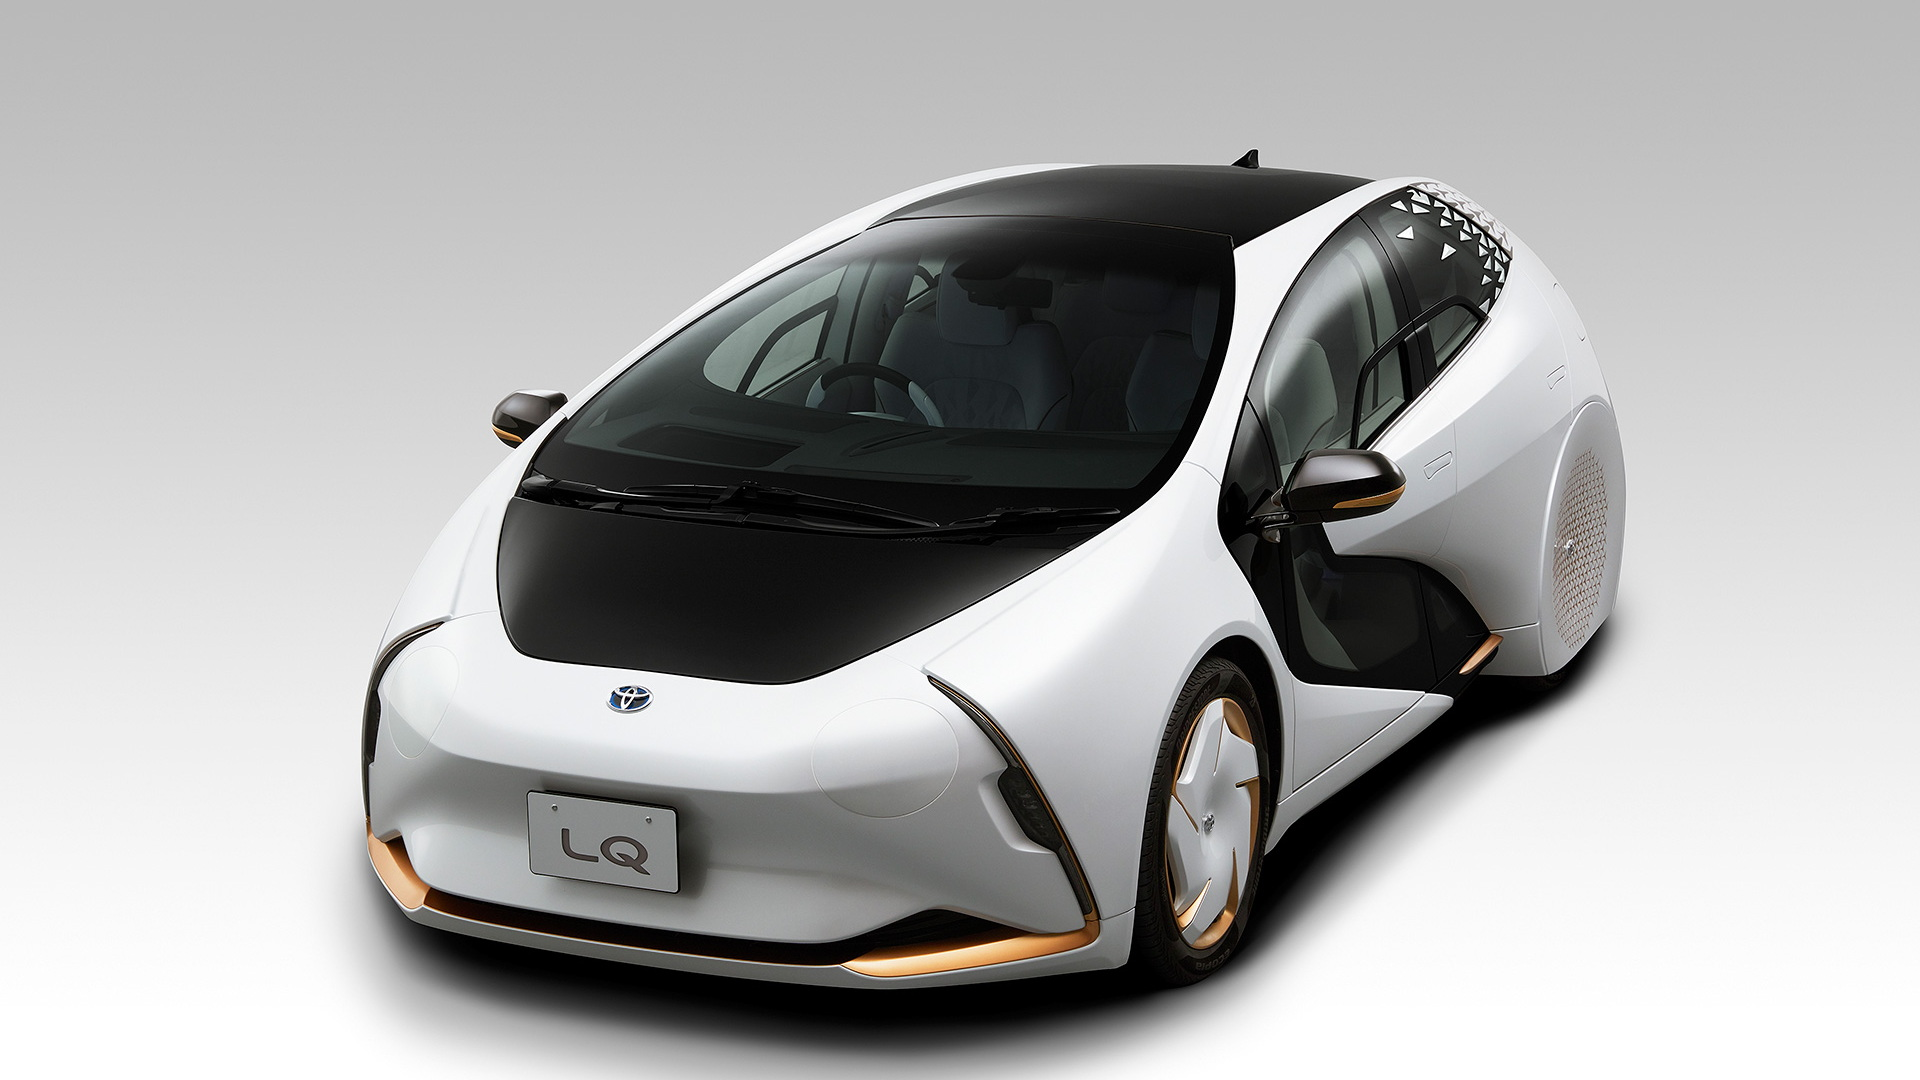 Toyota LQ concept car